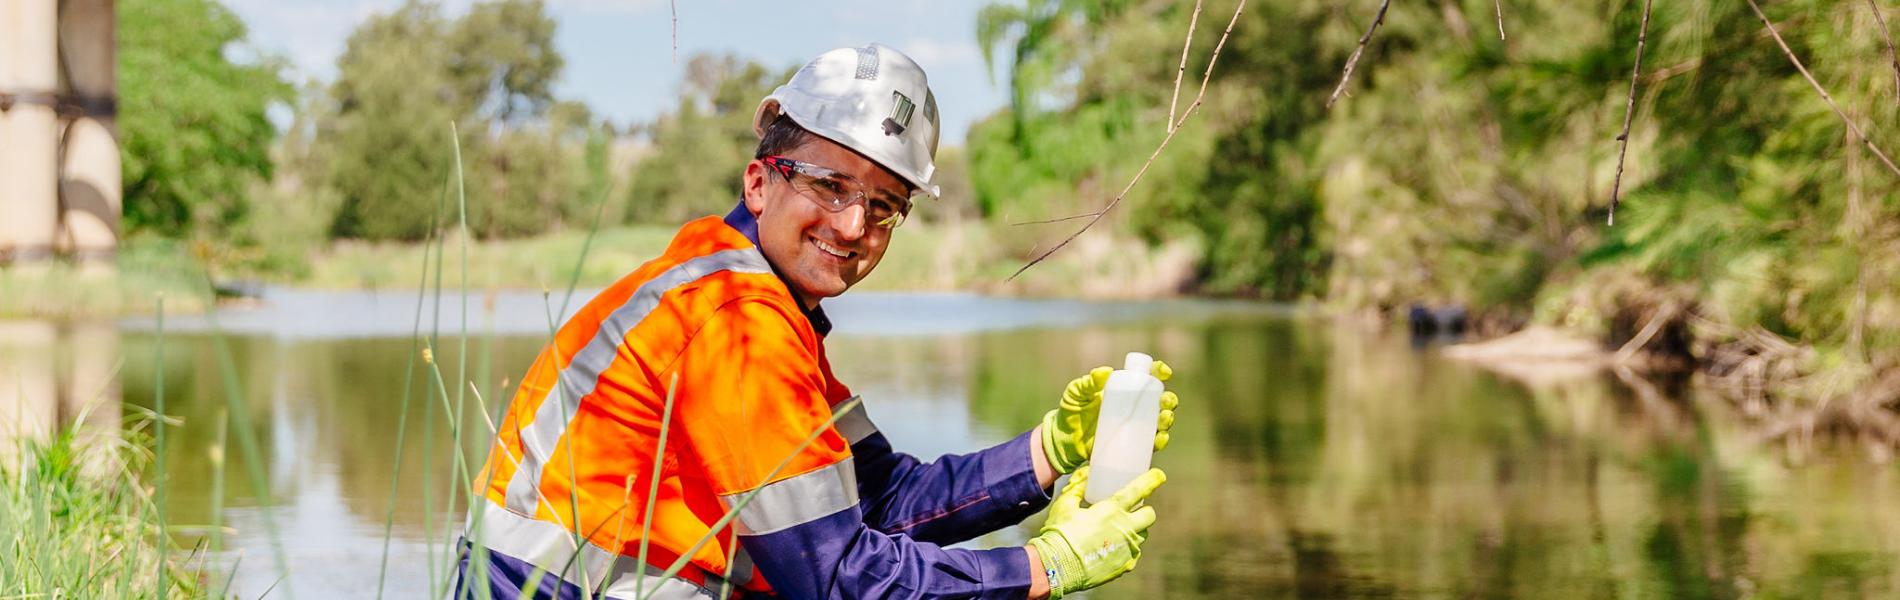 Upper Hunter Water Balance – Mining's Water Use